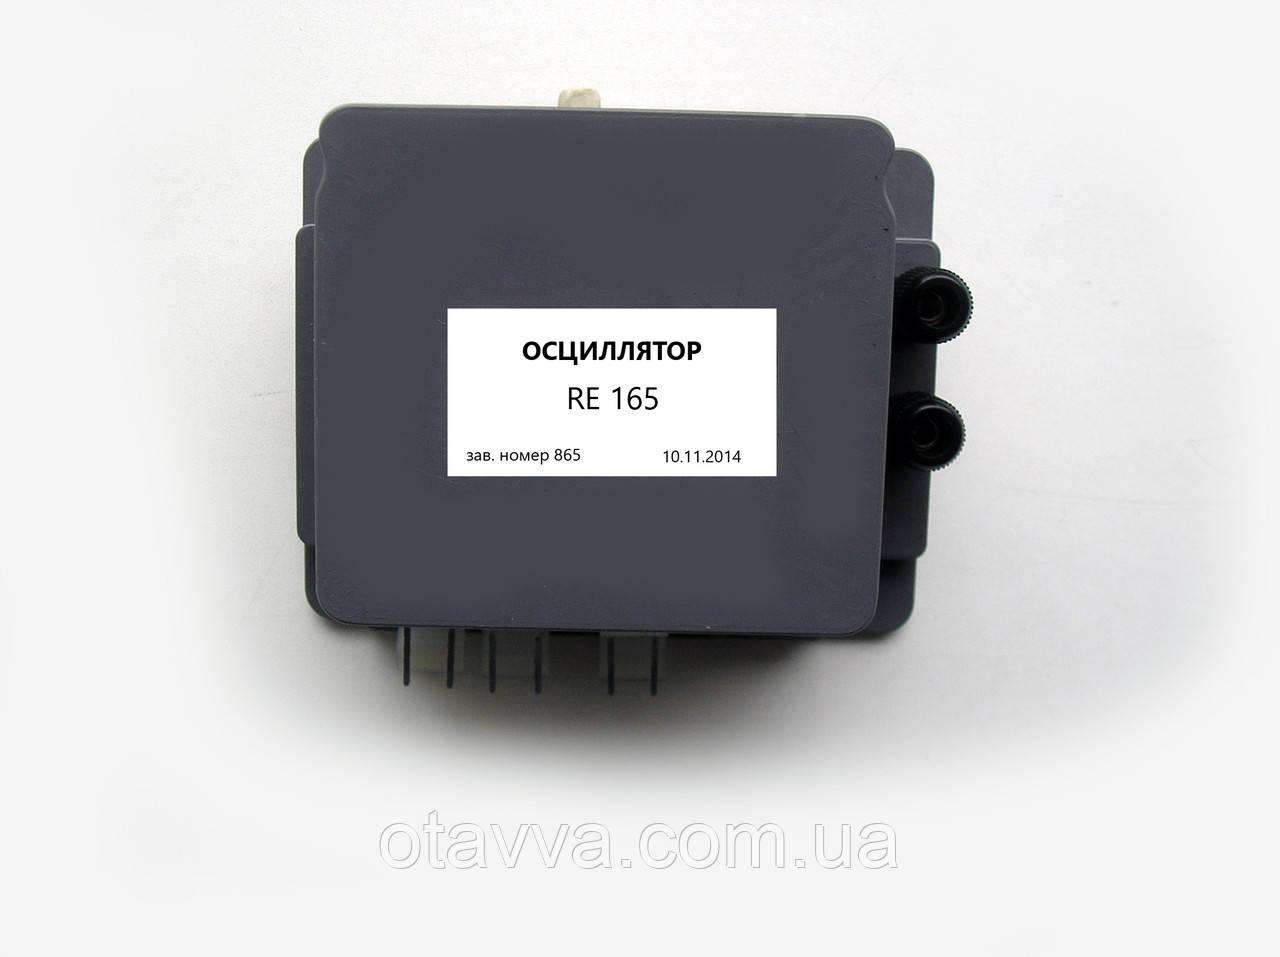 Осциллятор RE 165